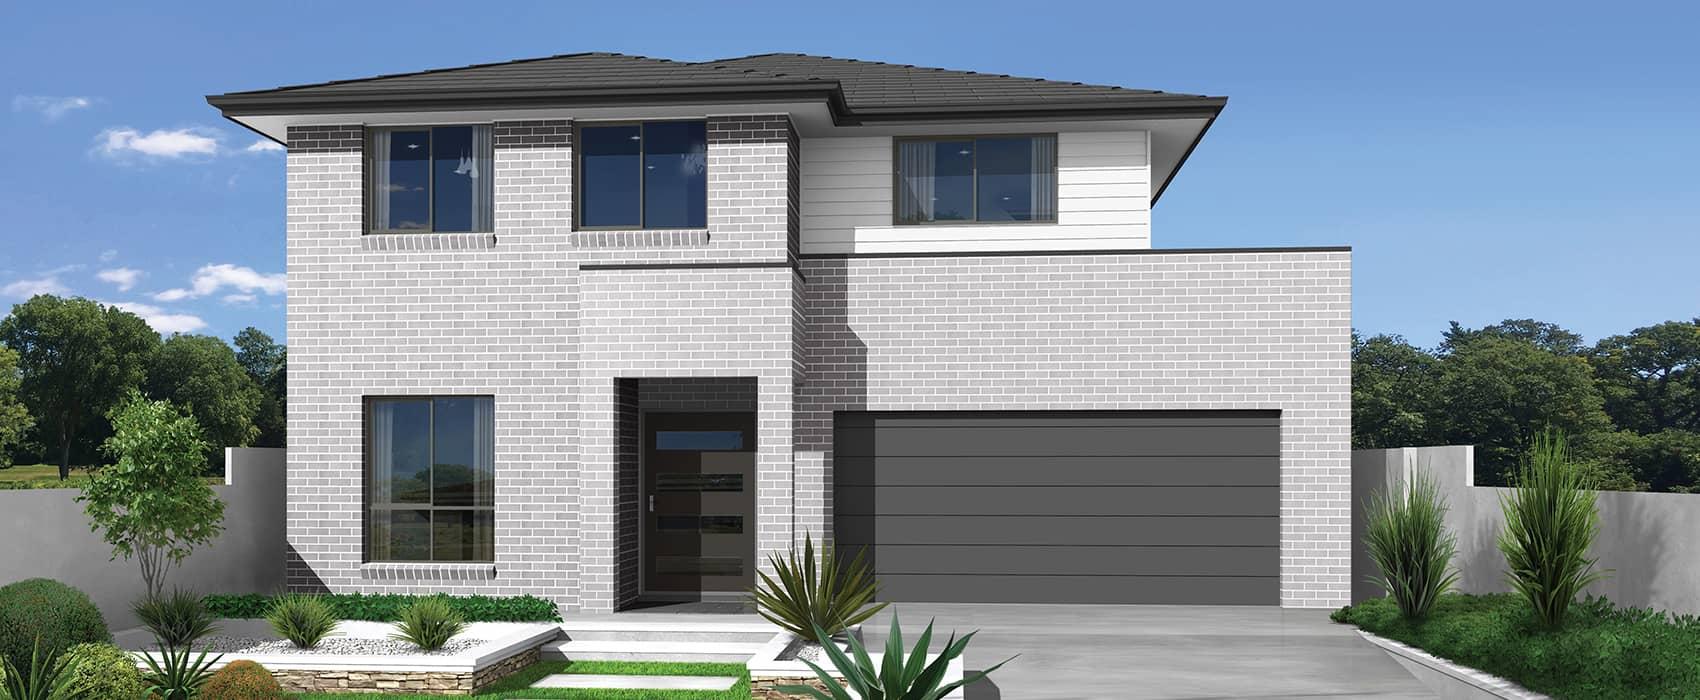 Universal Home Design